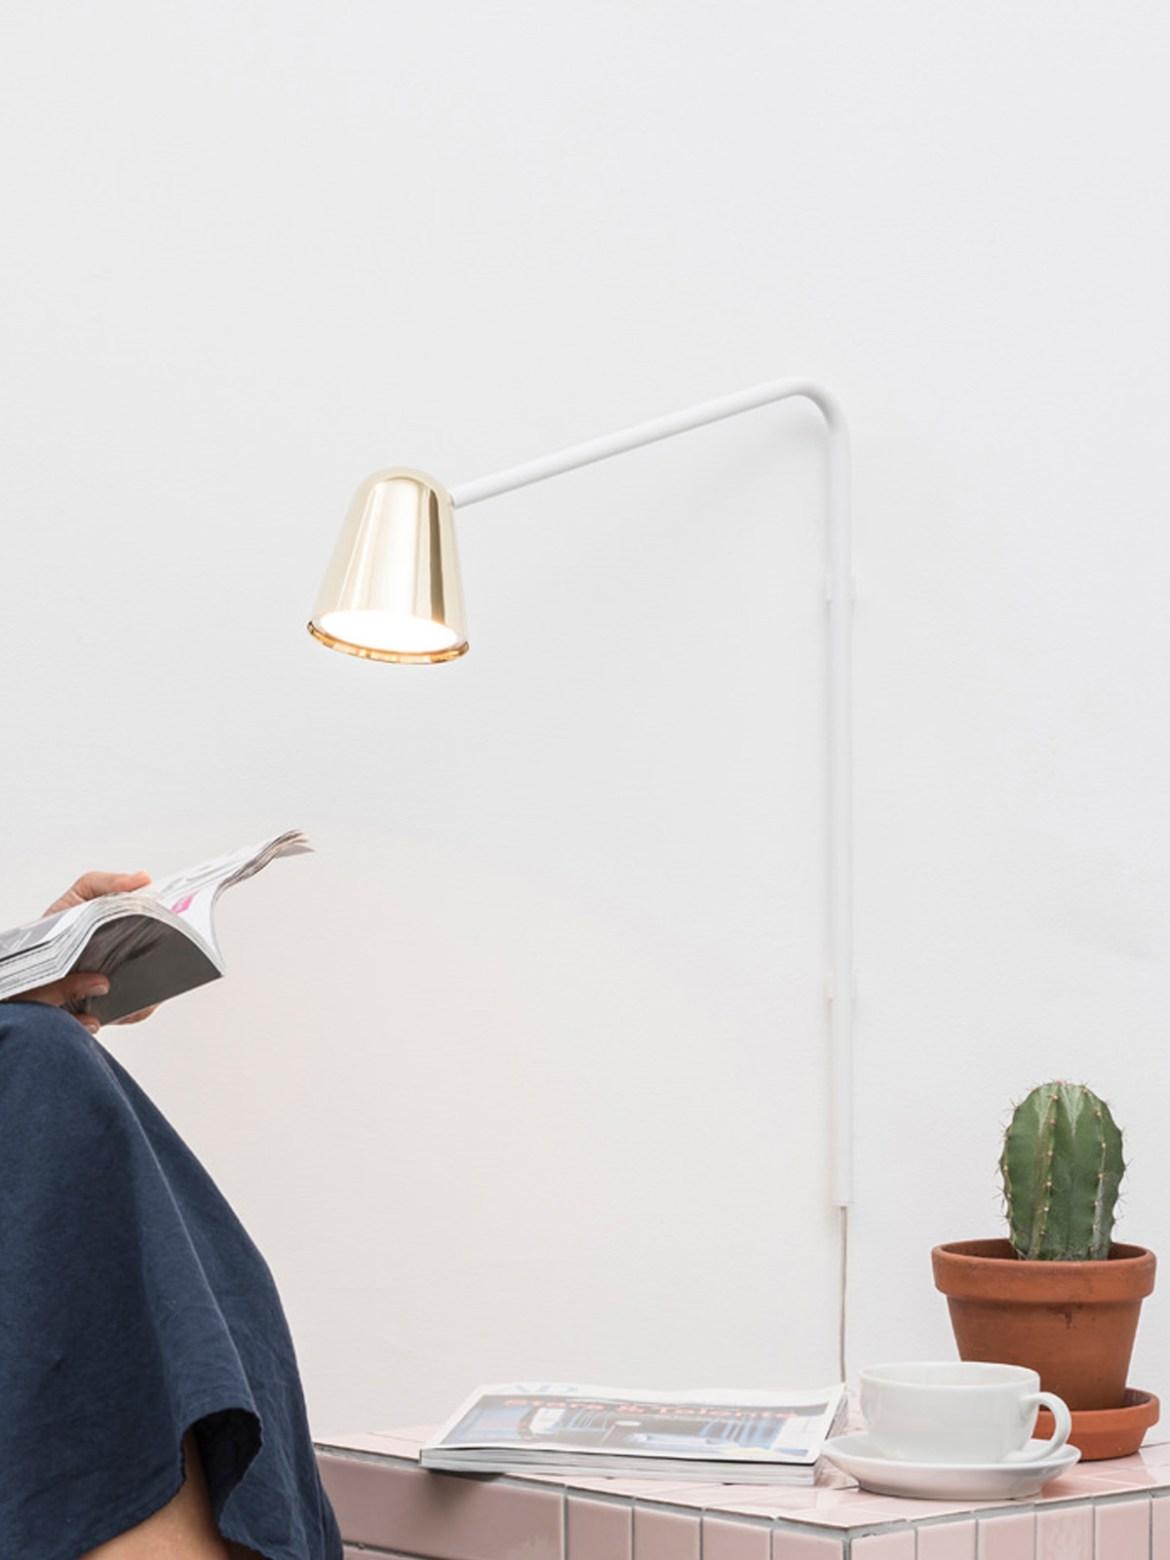 DesignOrt Blog: Leseleuchten LED Wandlampe mit Schalter Chaplin Wall Formagenda